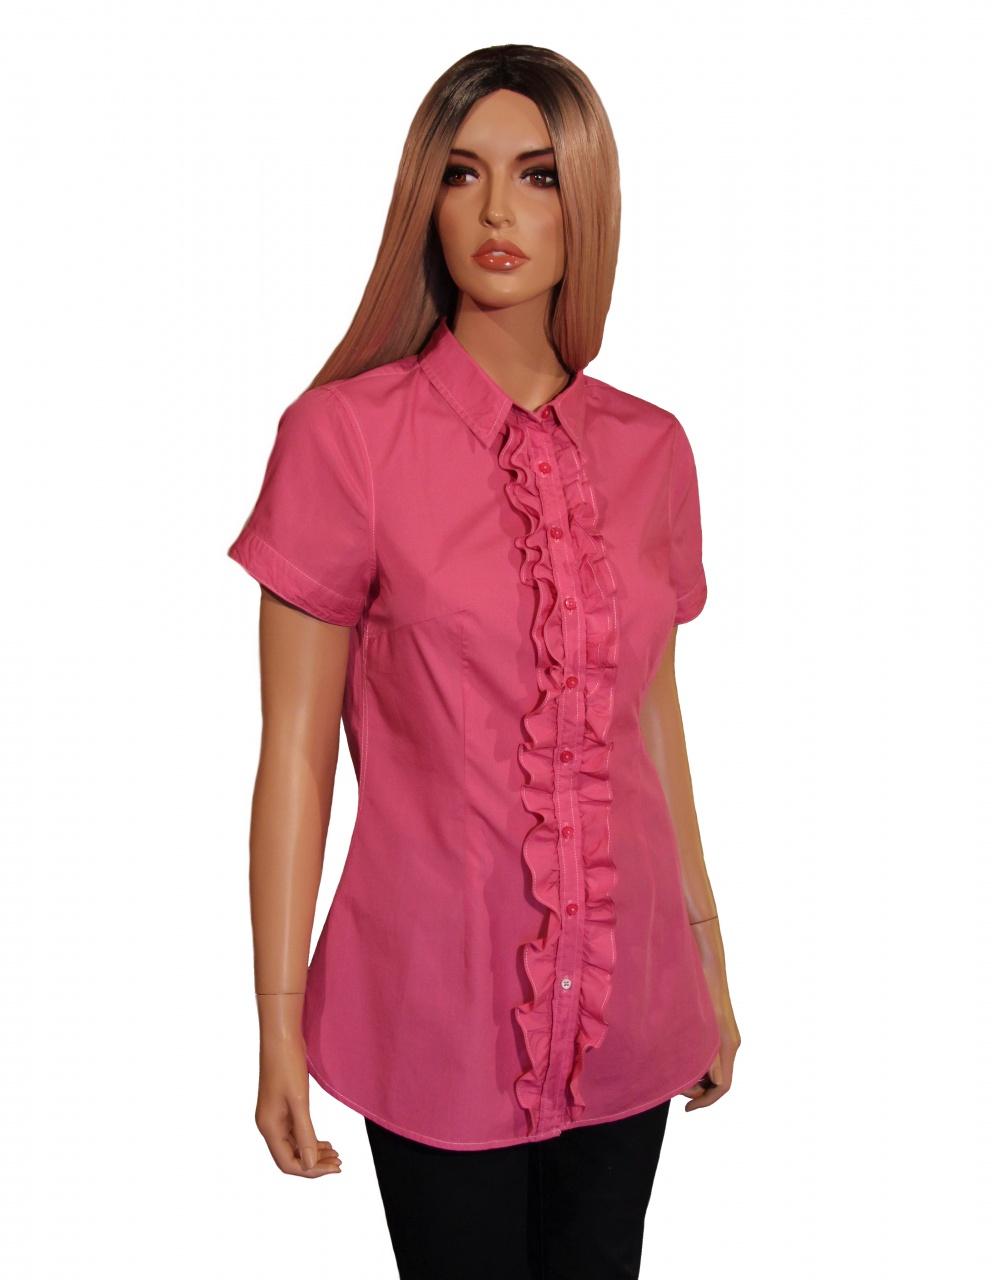 Блузка Tommy Hilfiger размер 44-46(М)